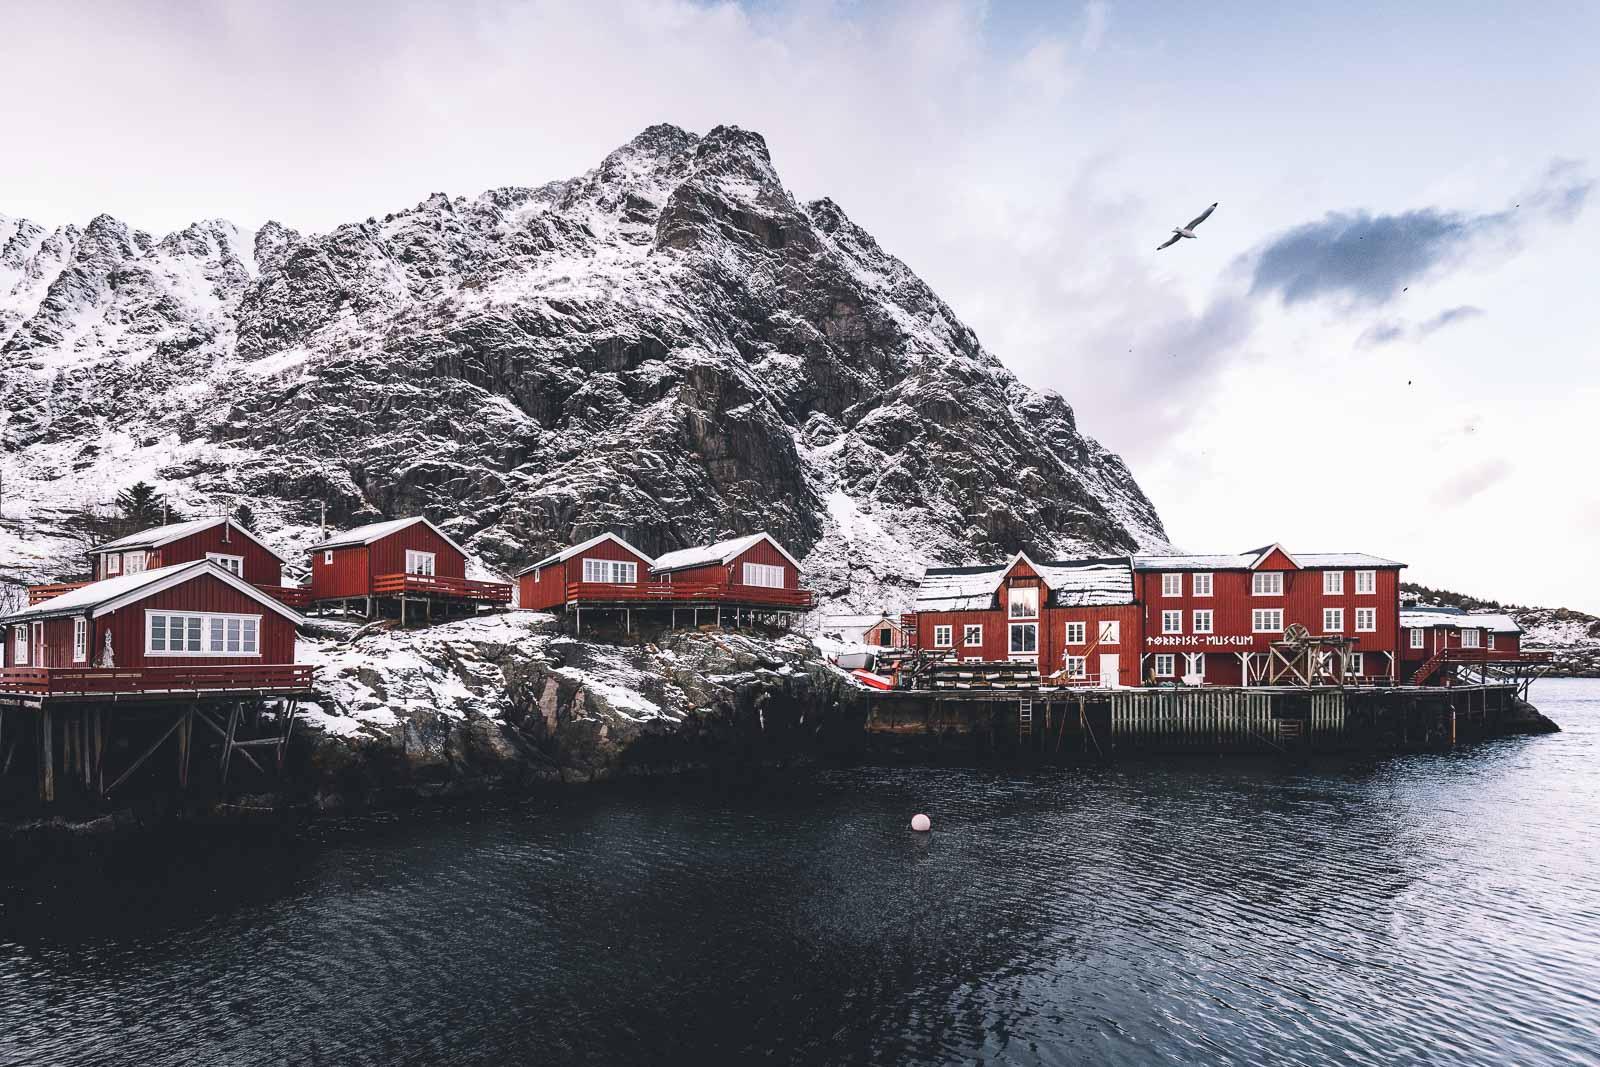 Utsiktspunkt, Å i Lofoten, Norway